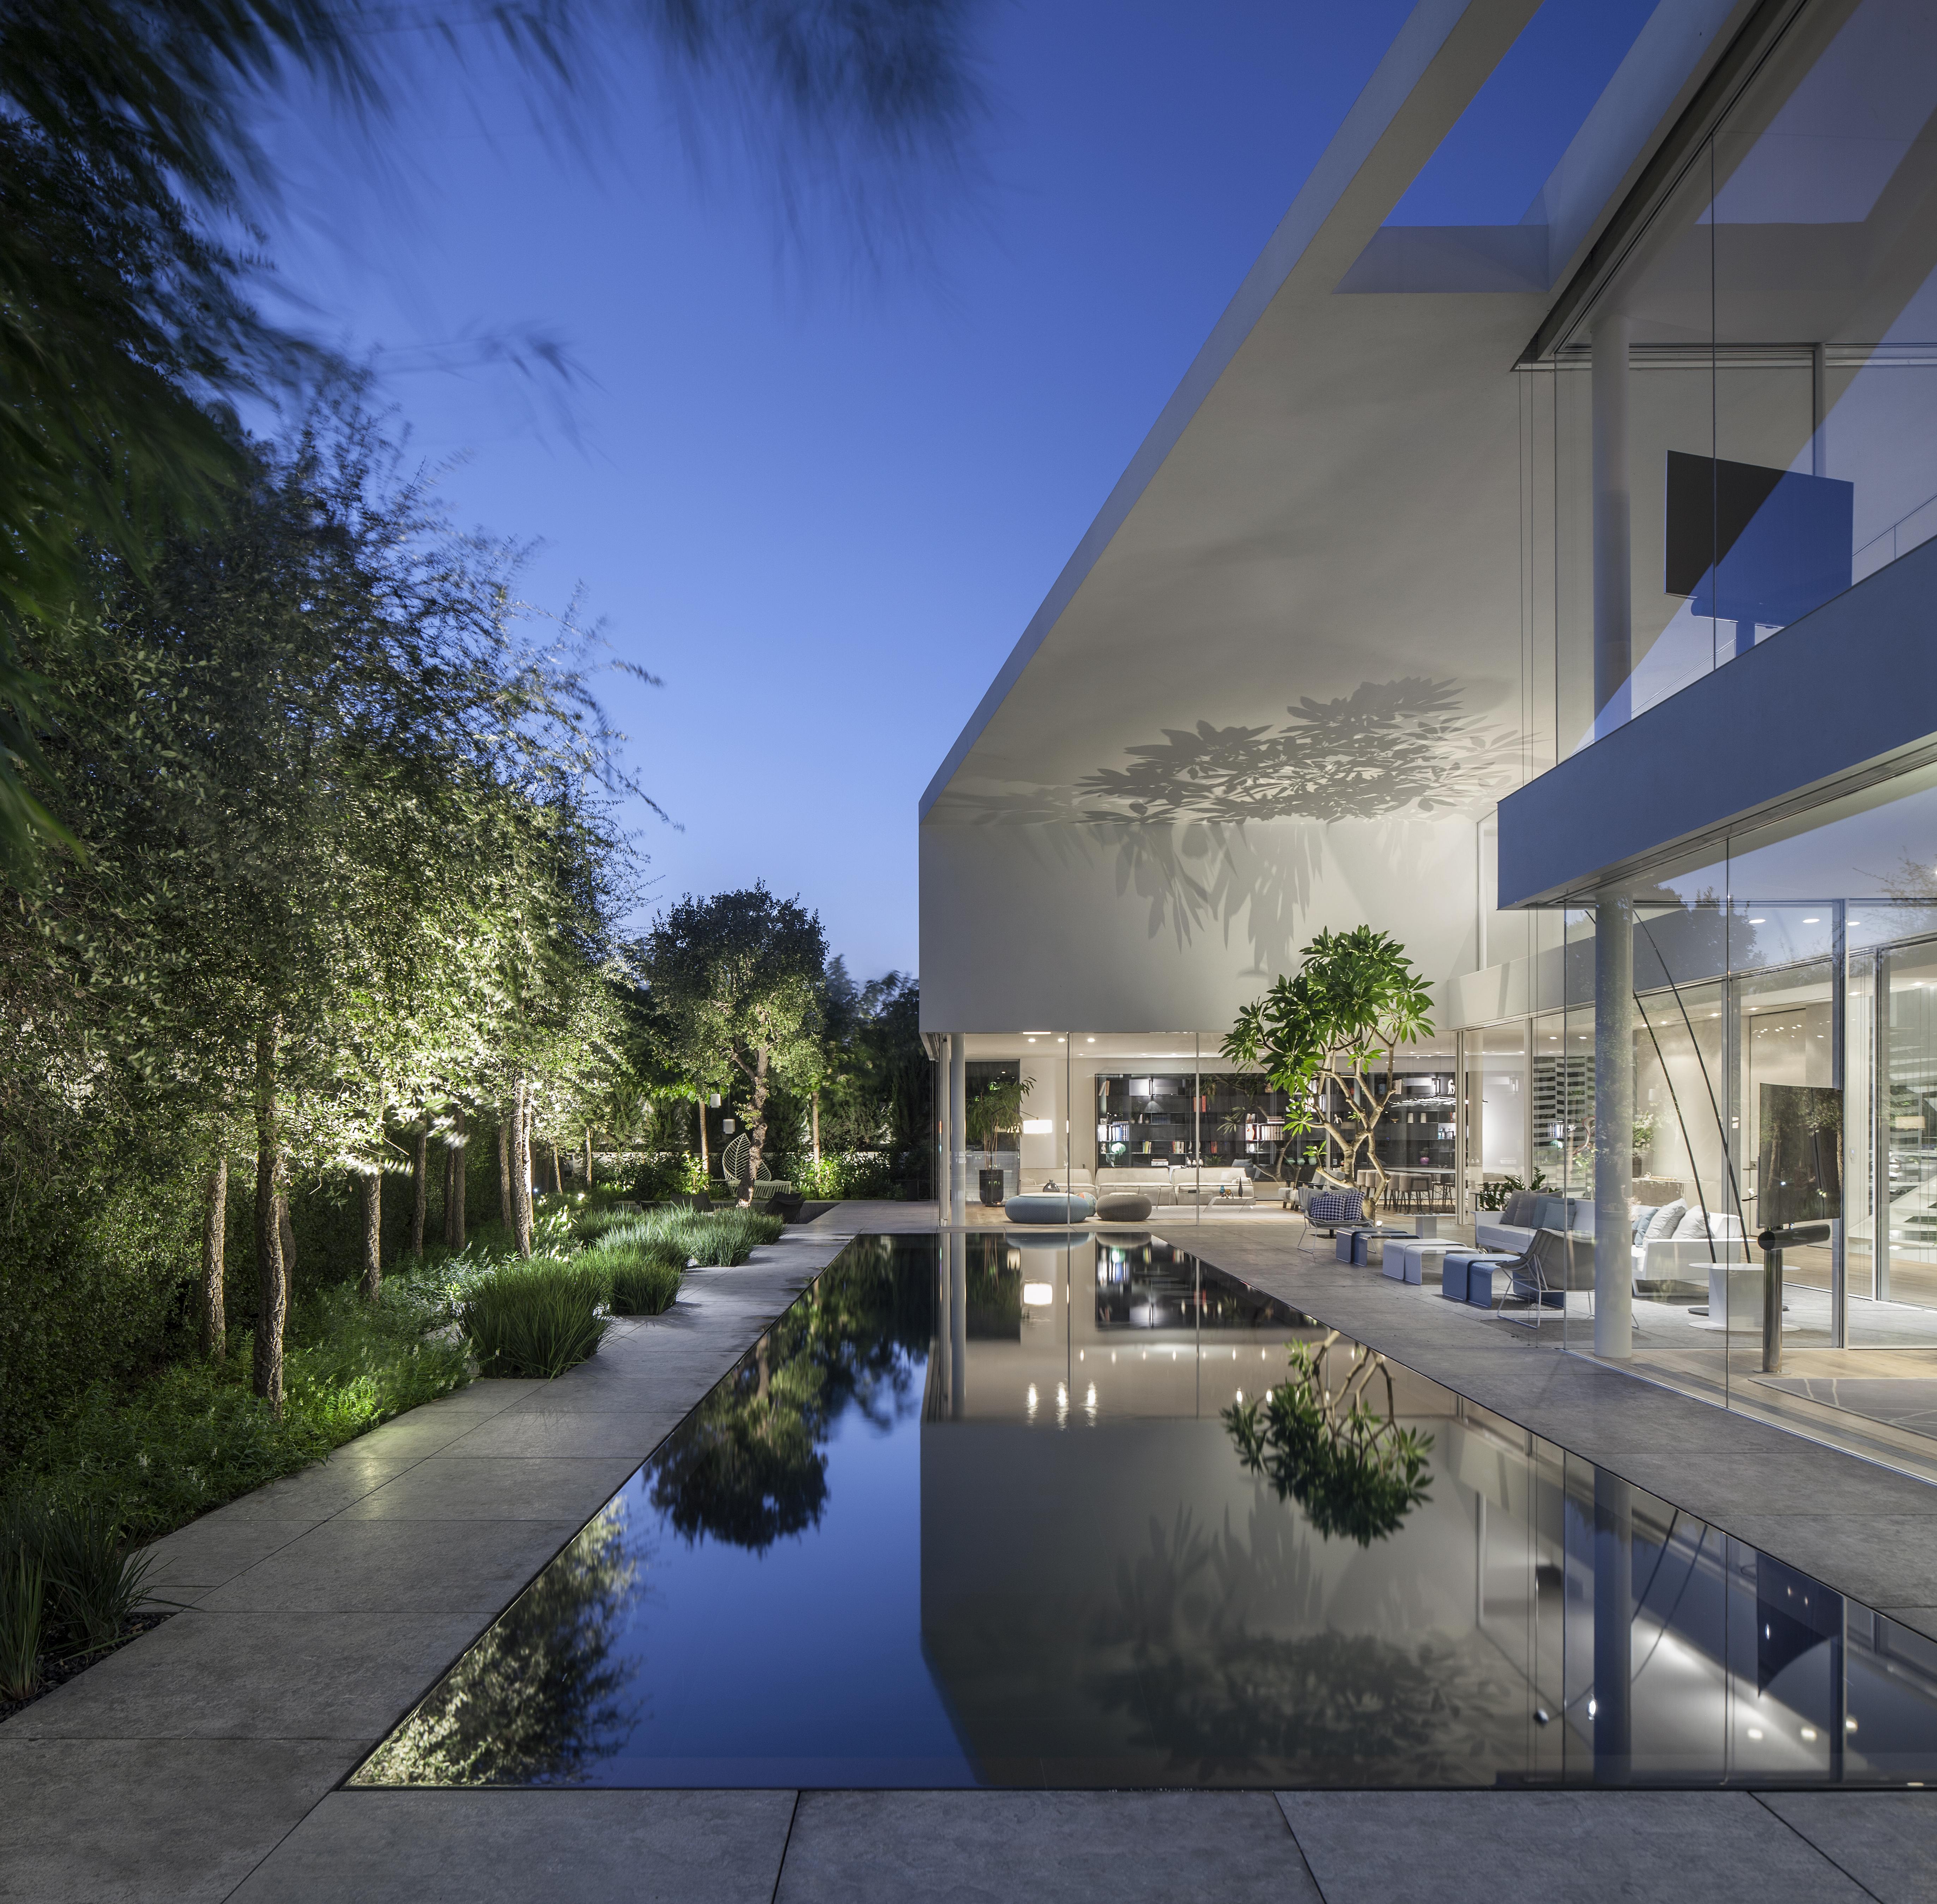 pitsou kedem zefyr life J House design architecture zefyrlife